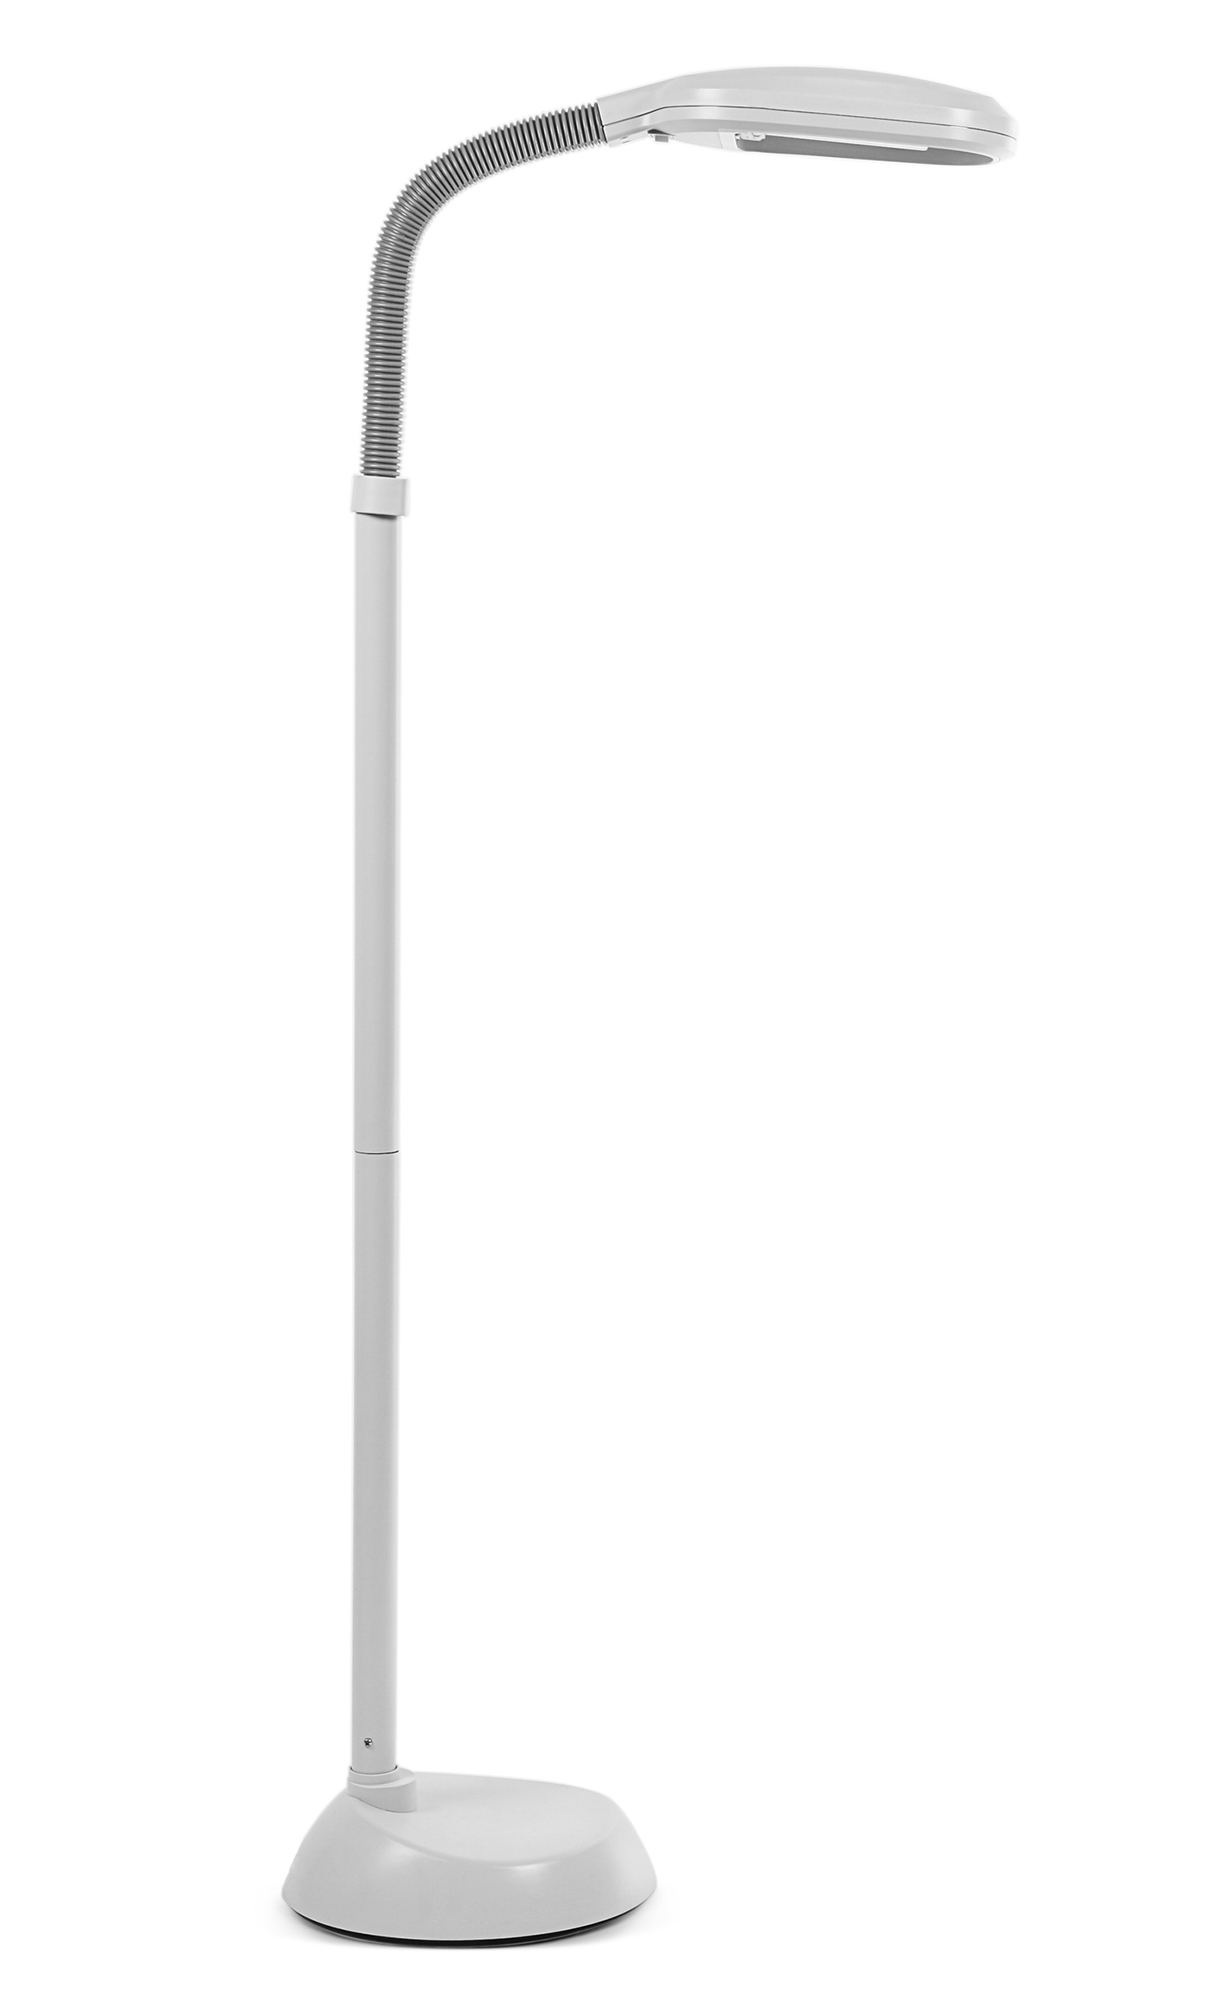 New natural daylight floor standing lamp high vision for Natural light reading floor lamp